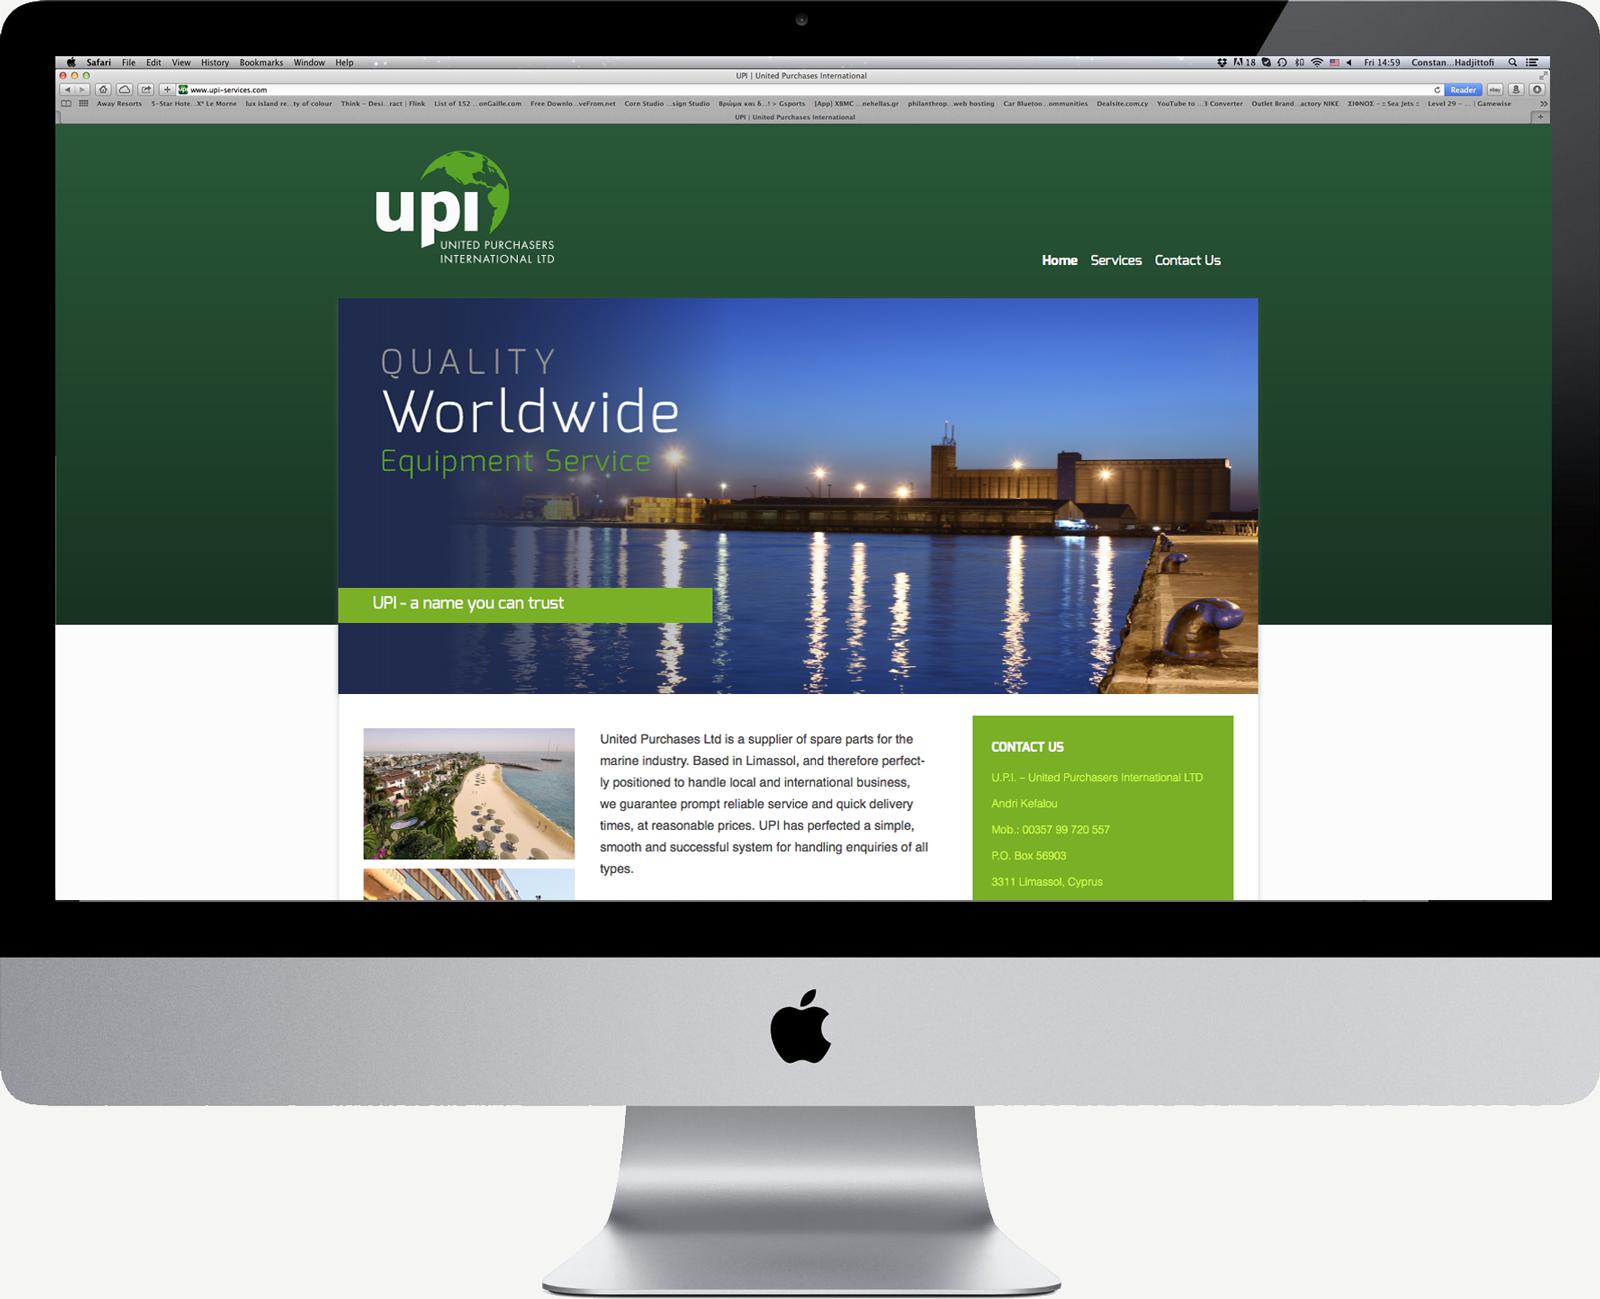 upi_cover1.png